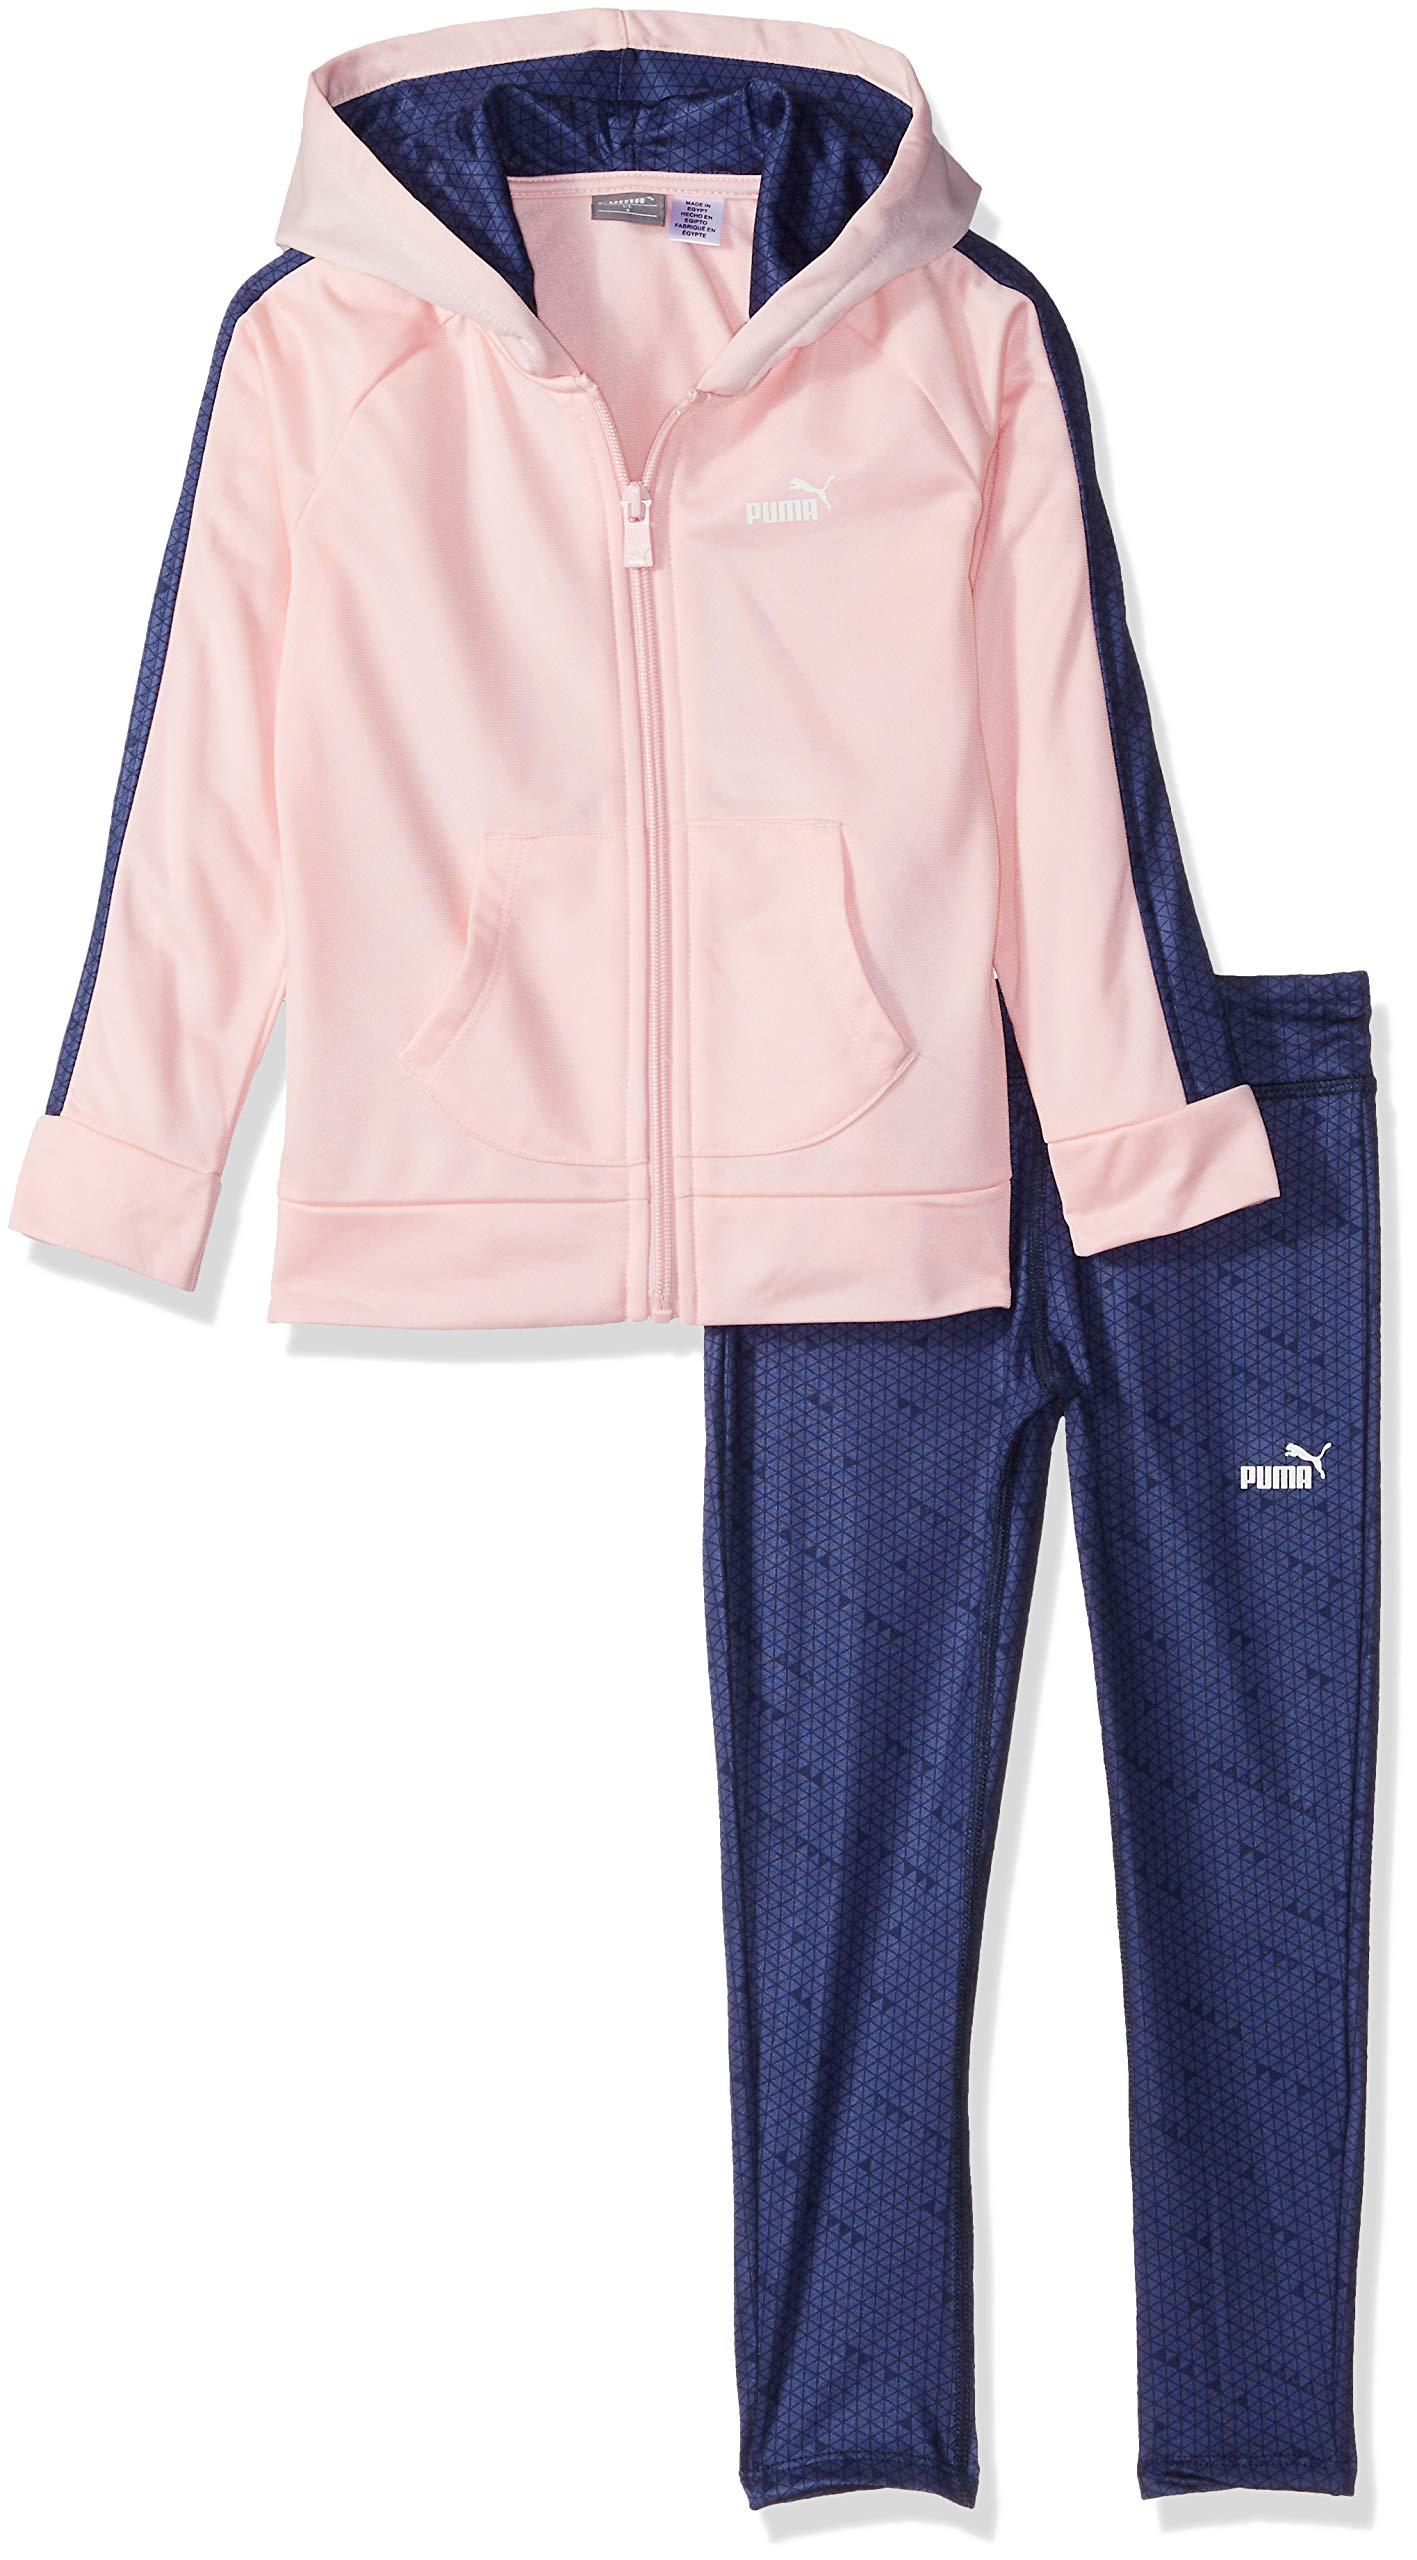 PUMA Little Girls' Track Jacket and Legging Set, Crystal Rose, 5